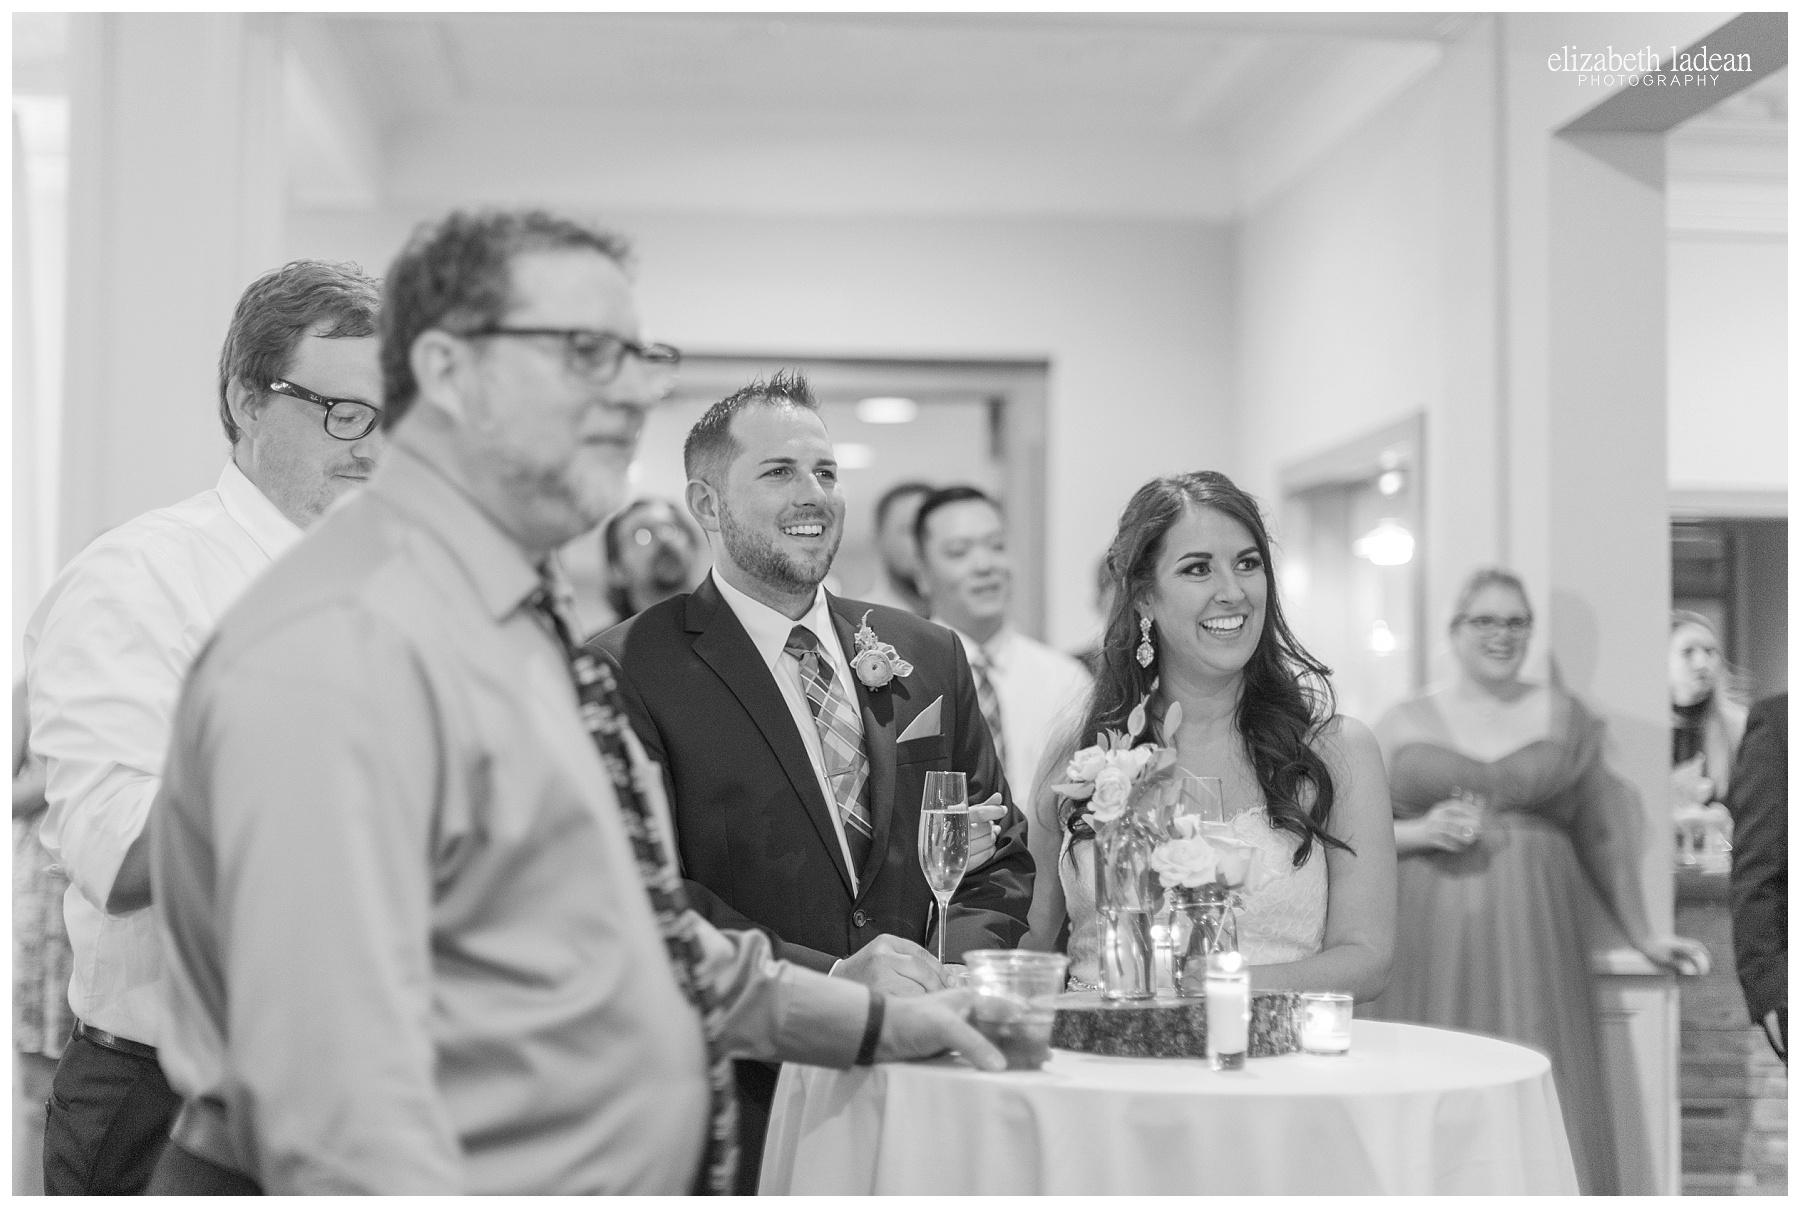 Hillcrest-Country-Club-Kansas-City-Wedding-Photography-E+J-0520-Elizabeth-Ladean-Photography-photo_0874.jpg